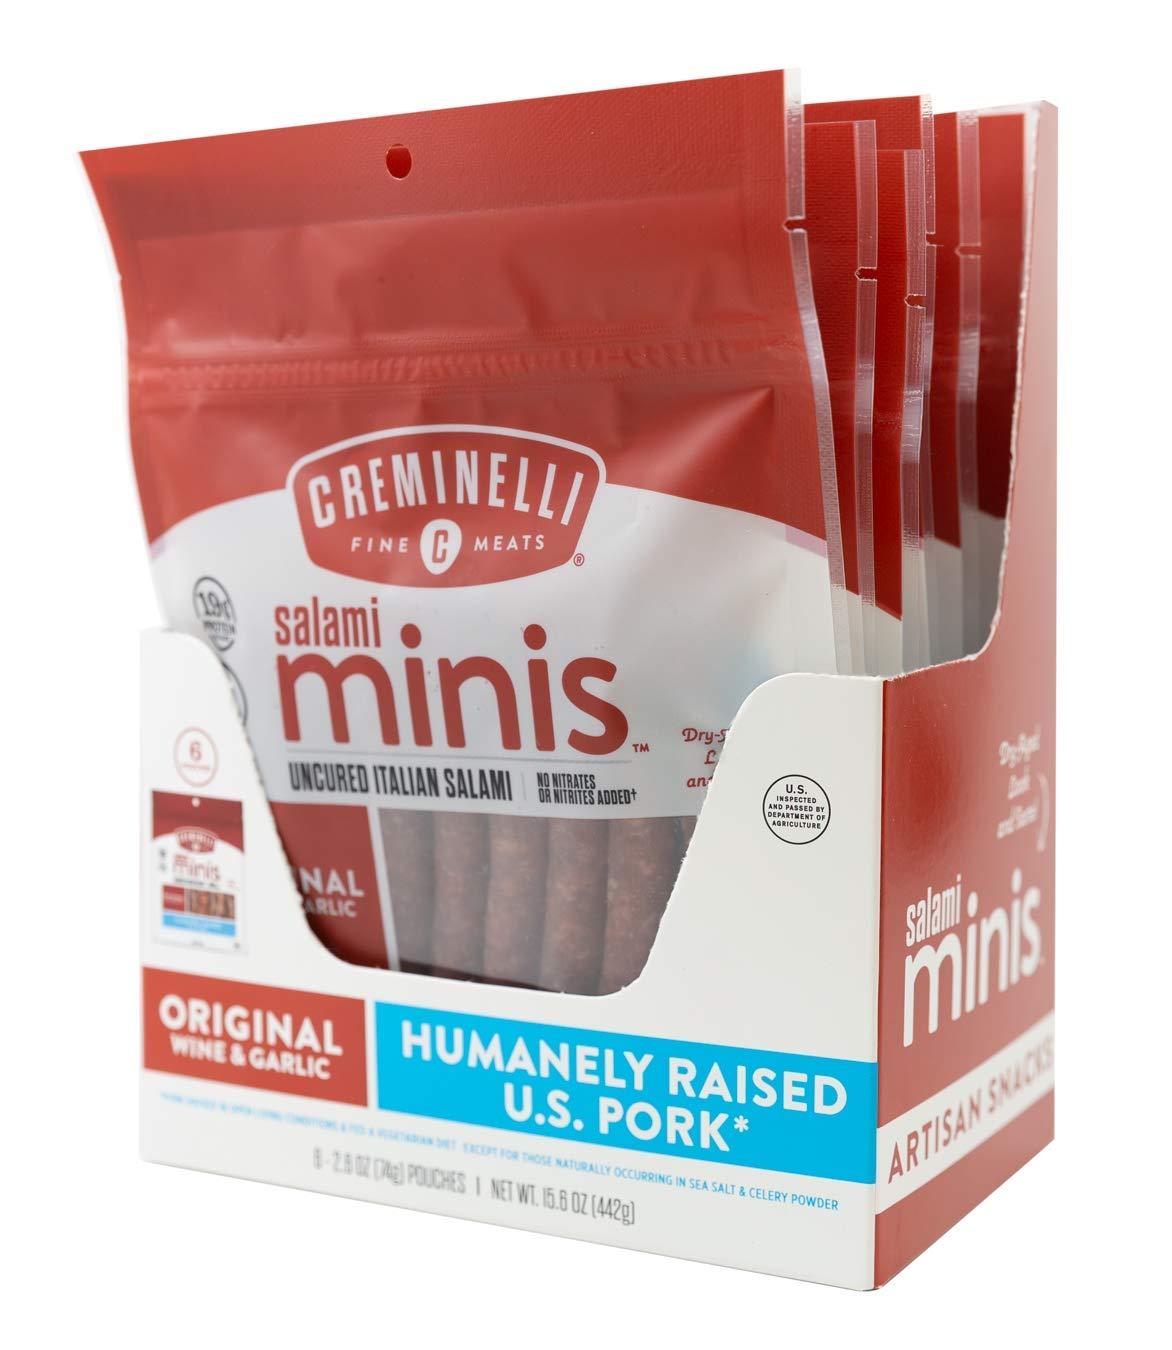 Creminelli Original Salami Mini Snacks, Humanely-Raised U.S. Pork, Keto & Paleo Friendly, 19g of Protein - Sugar Free, Gluten Free, No Added Nitrates or Nitrites (Original, 2.6oz 6 Pack)